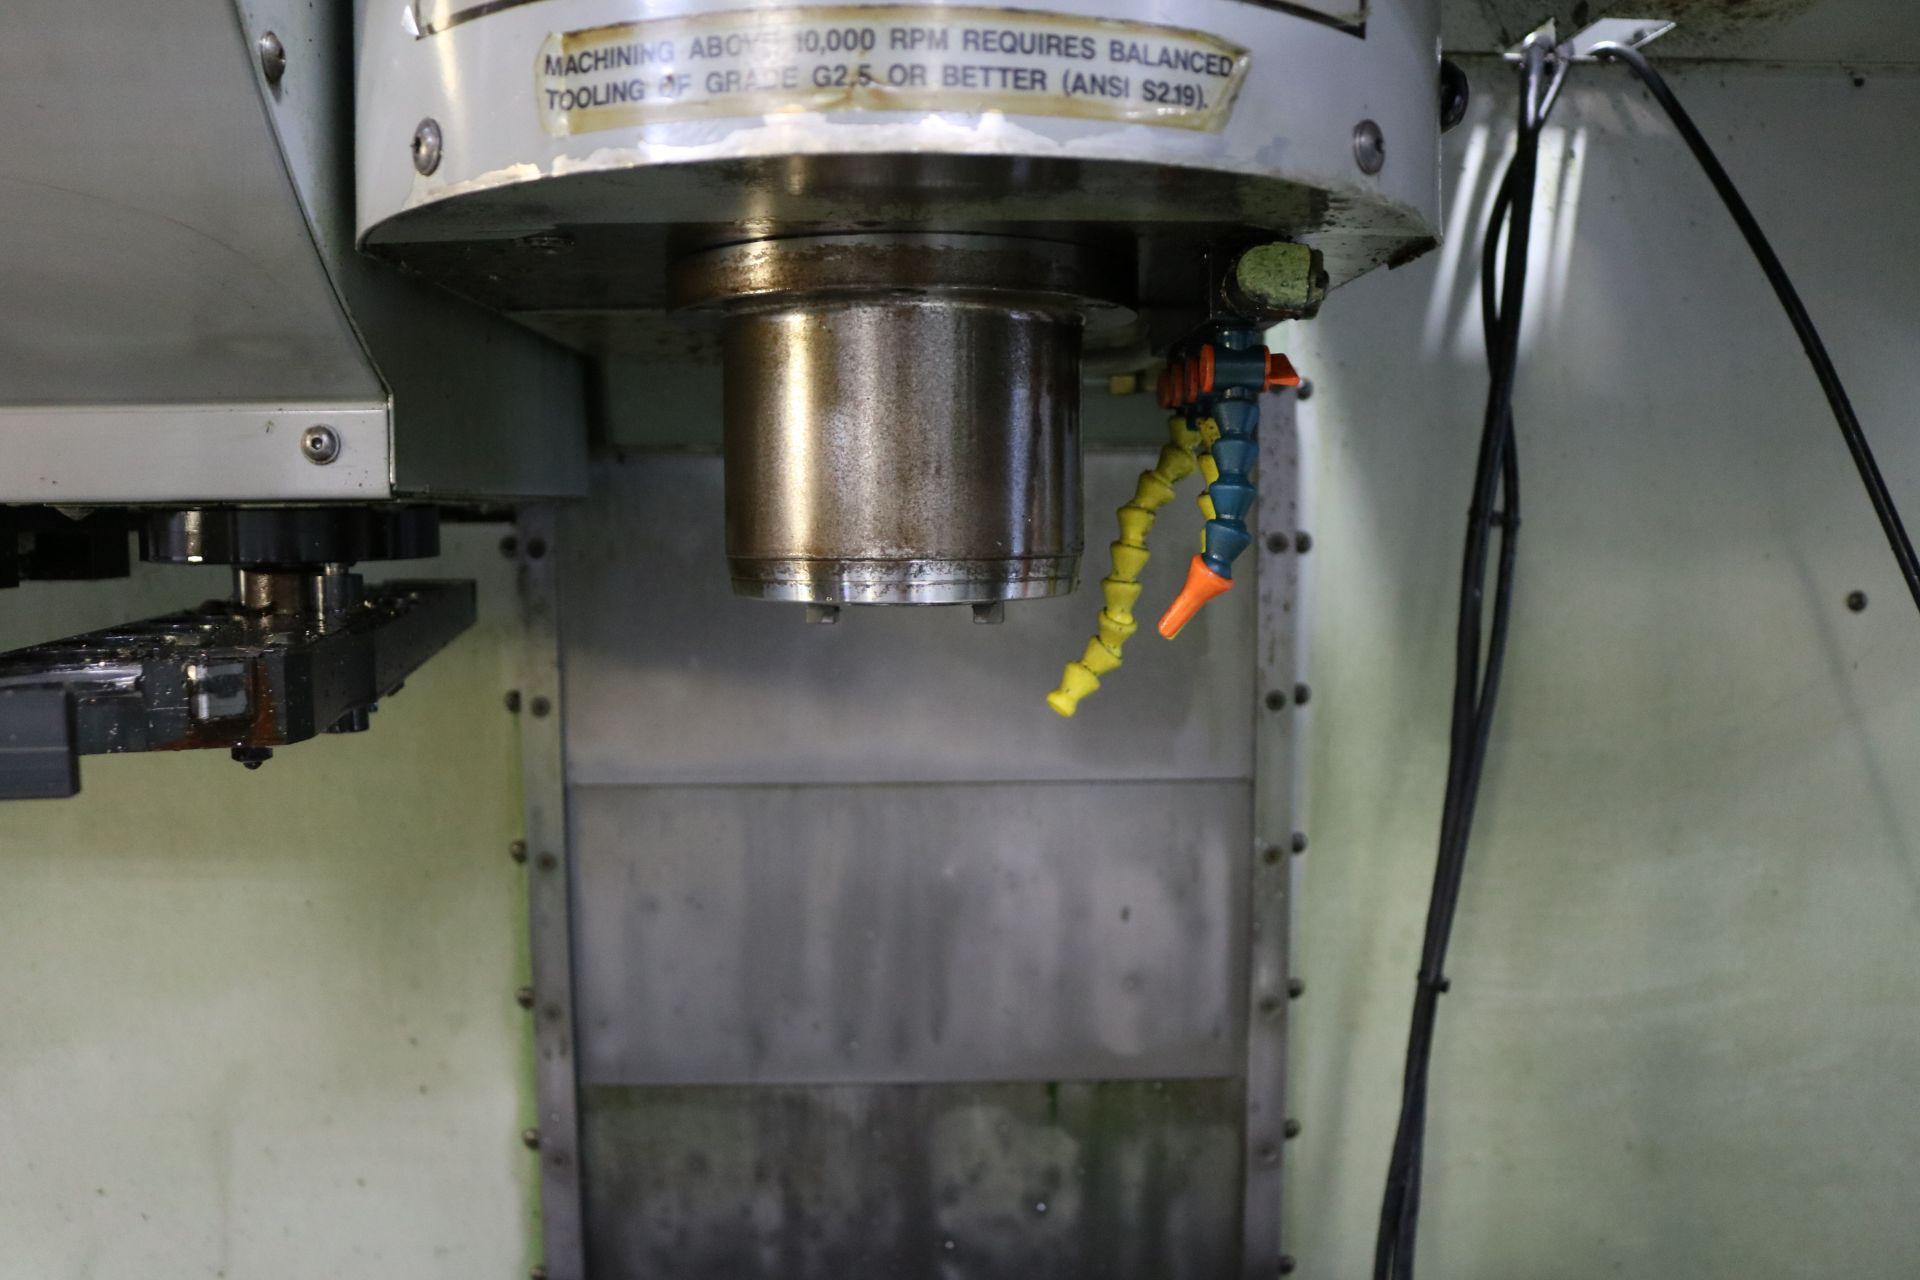 "Lot 11 - 2005 HAAS VF-2SS CNC VERTICAL MACHINING CENTER, TRAVELS: 30"" X 16"" X 20"", 36"" X 14"" TABLE, 12,000"